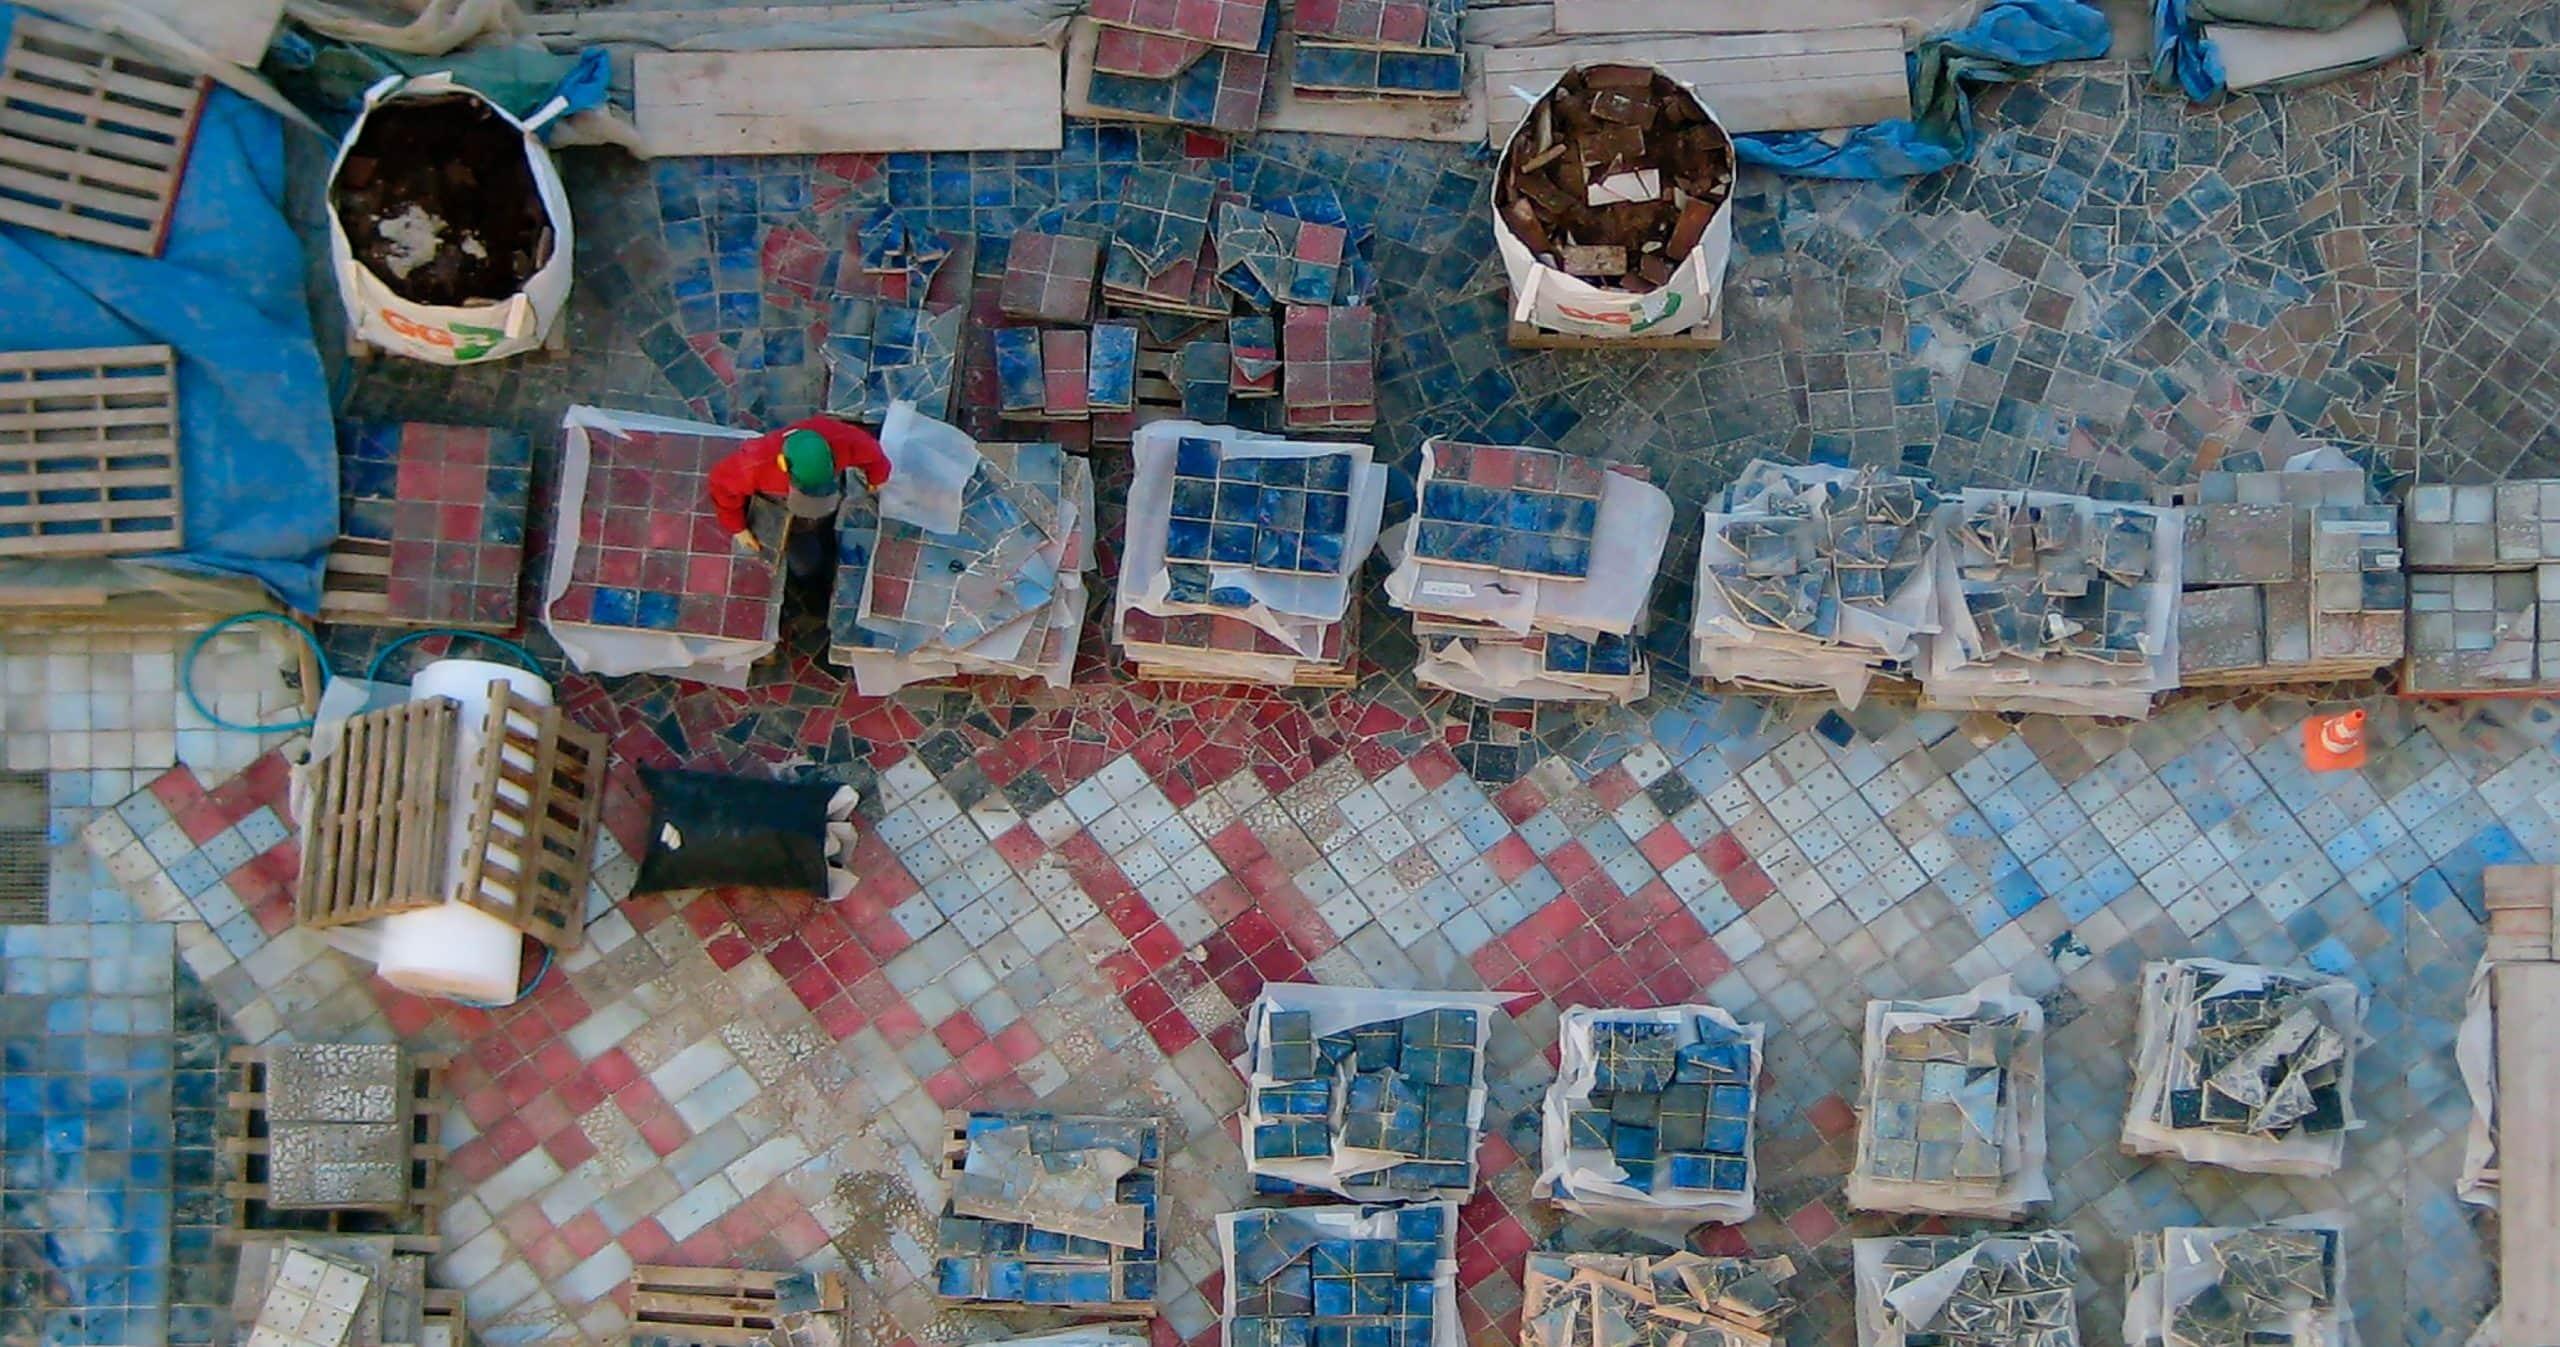 restauración y rehabilitación de edificios Terraza Artística